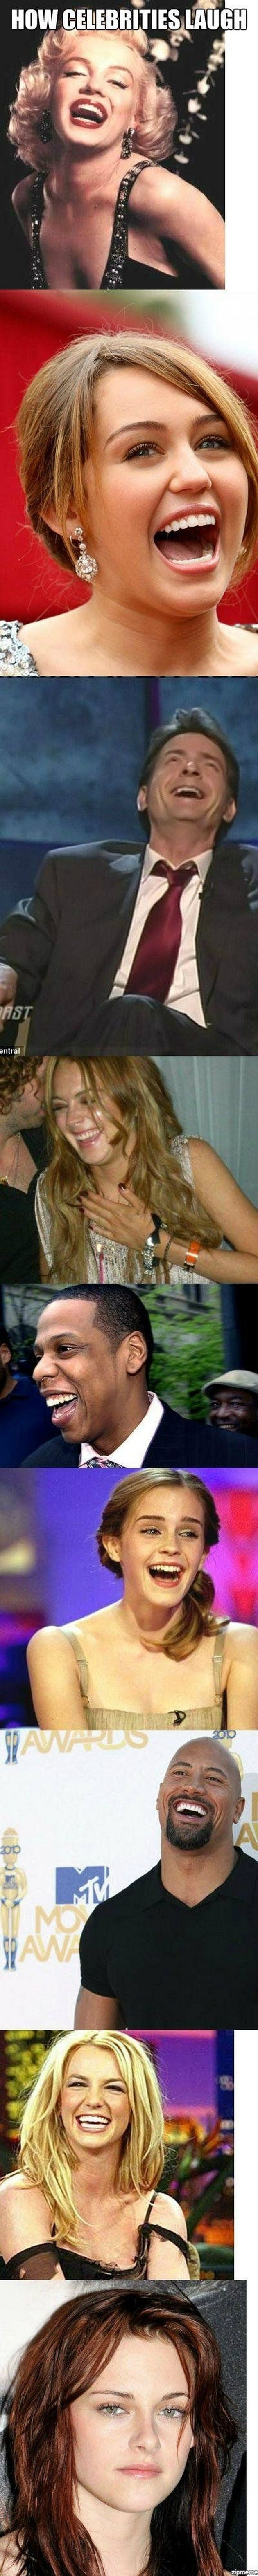 Celebrity Funnies (25 Pics)Vitamin-Ha | Vitamin-Ha